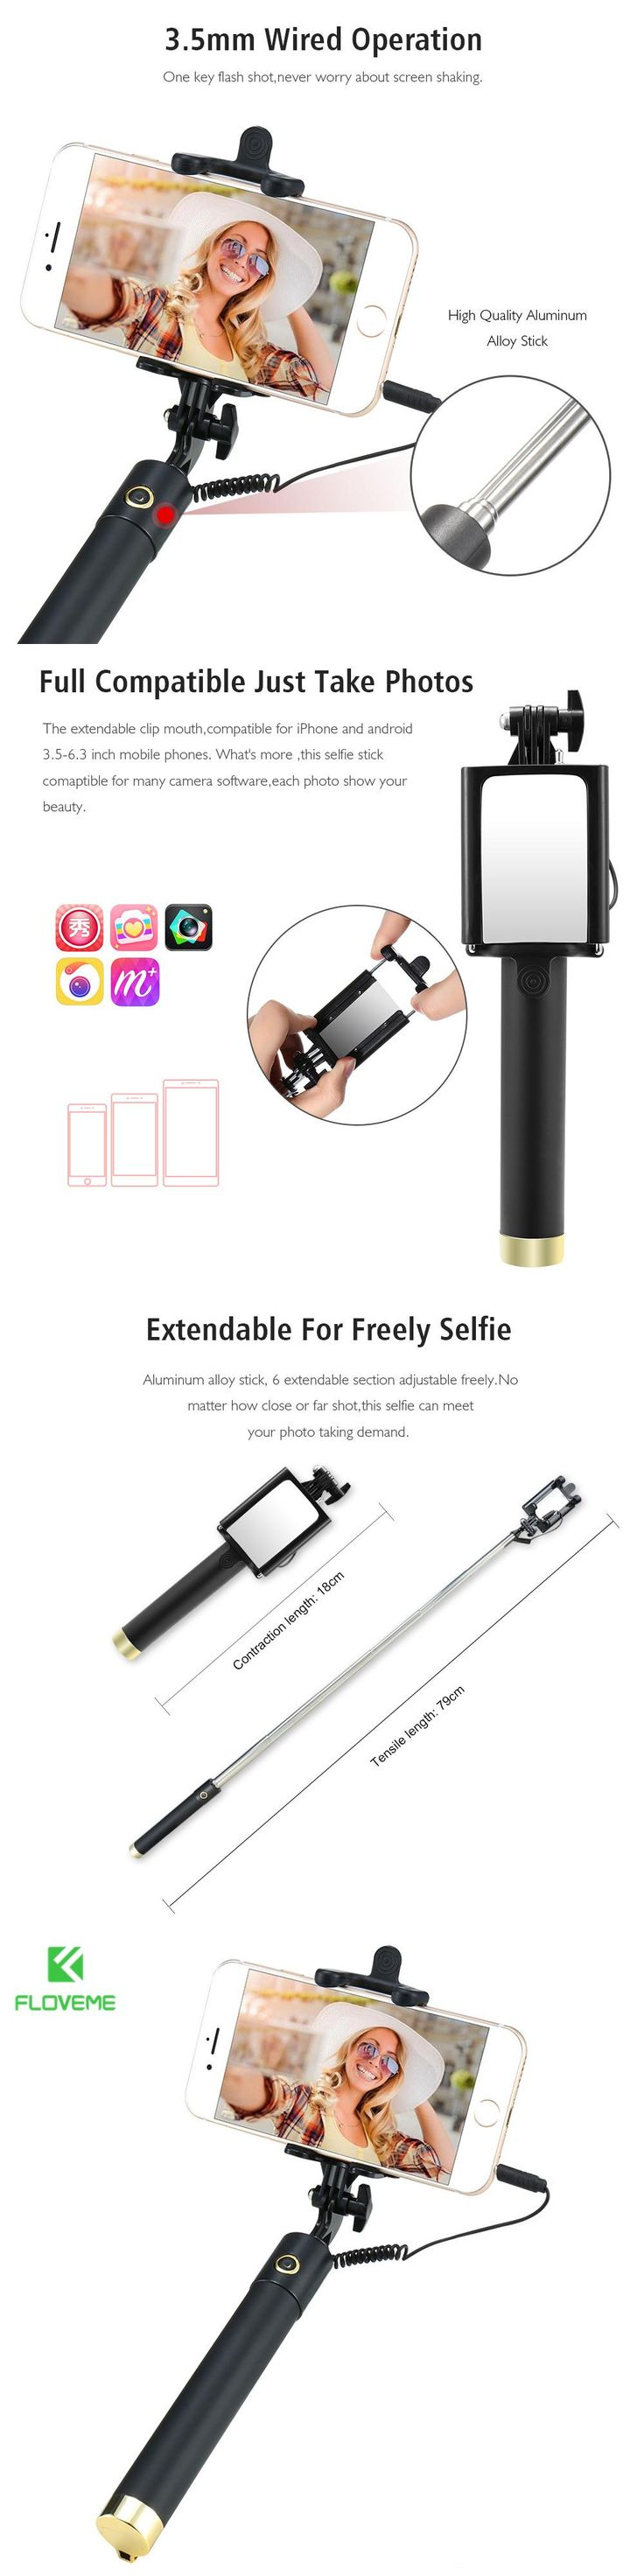 FLOVEME Selfie Stick For iPhone 7 128 Monopod Extendable Wired Selfi Selfie Stick with Mirror Perche Sticks Tripod Accessories